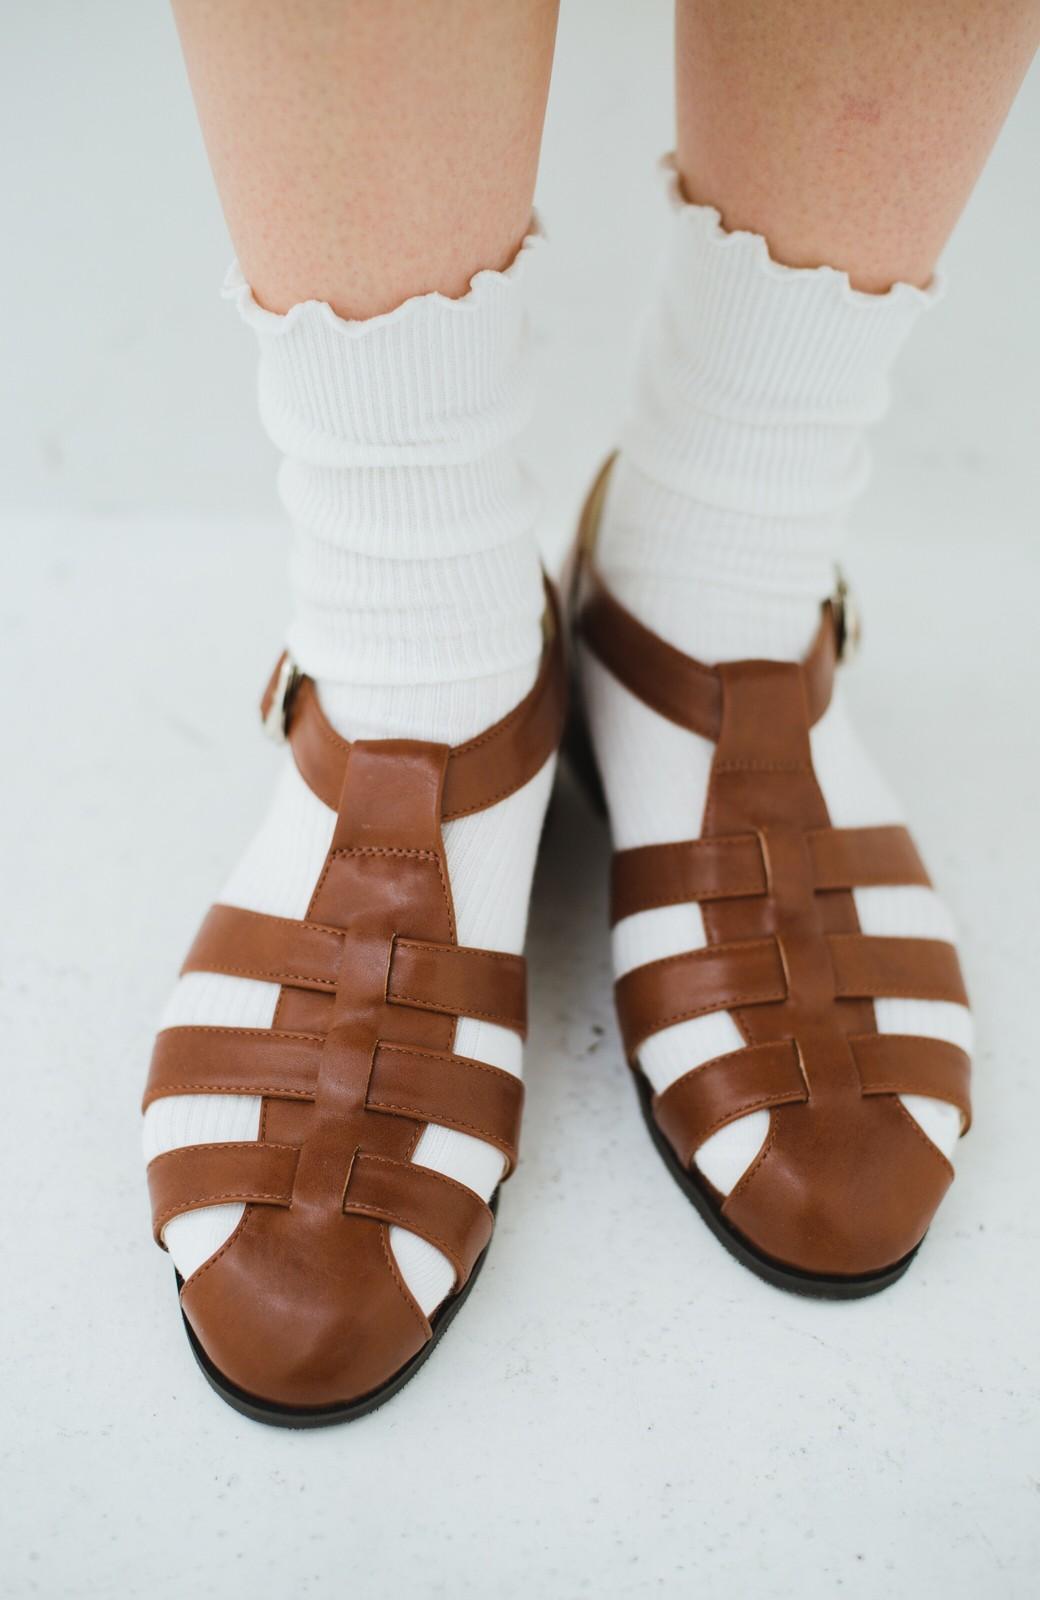 haco! 靴下でも素足でも合う 本革風編み込みサンダル <ブラウン>の商品写真7